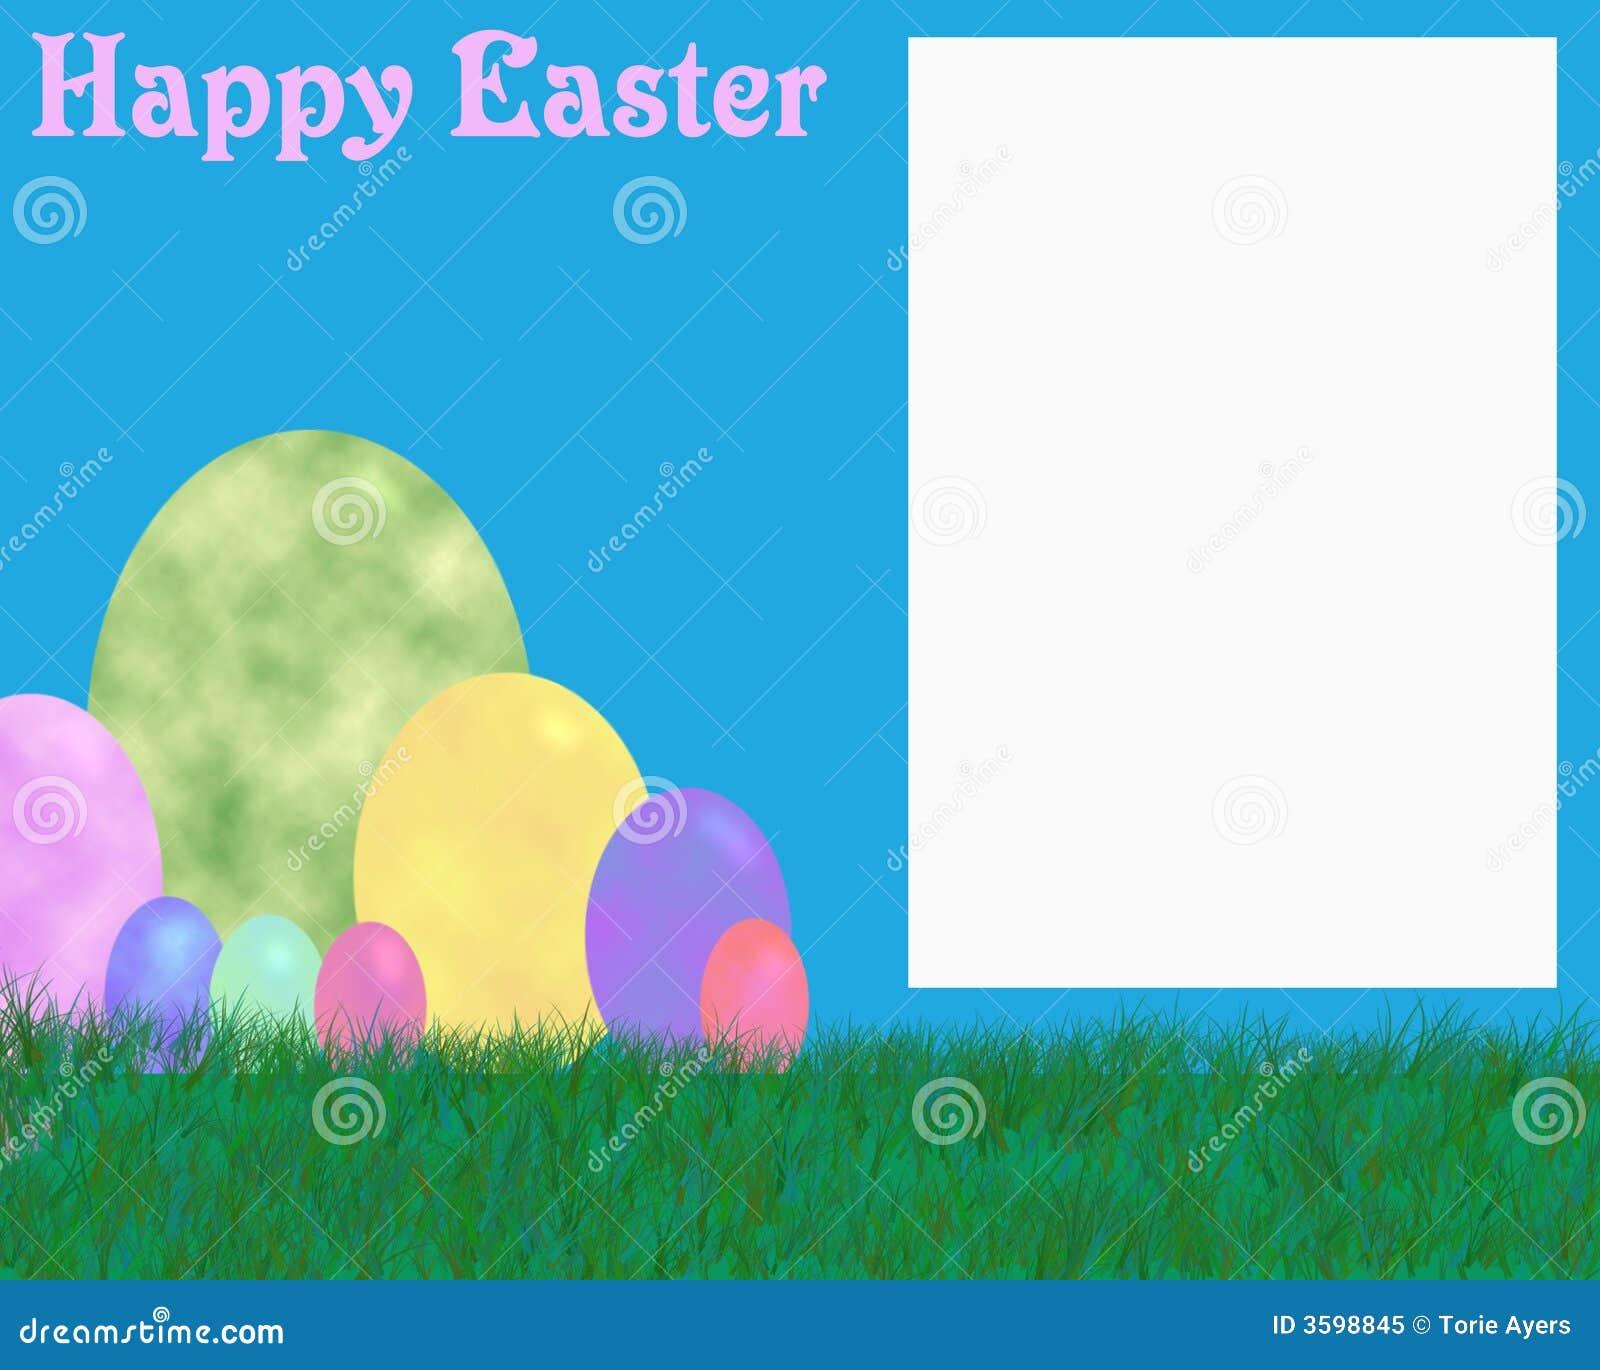 Funky Easter Picture Frames Model - Framed Art Ideas - roadofriches.com